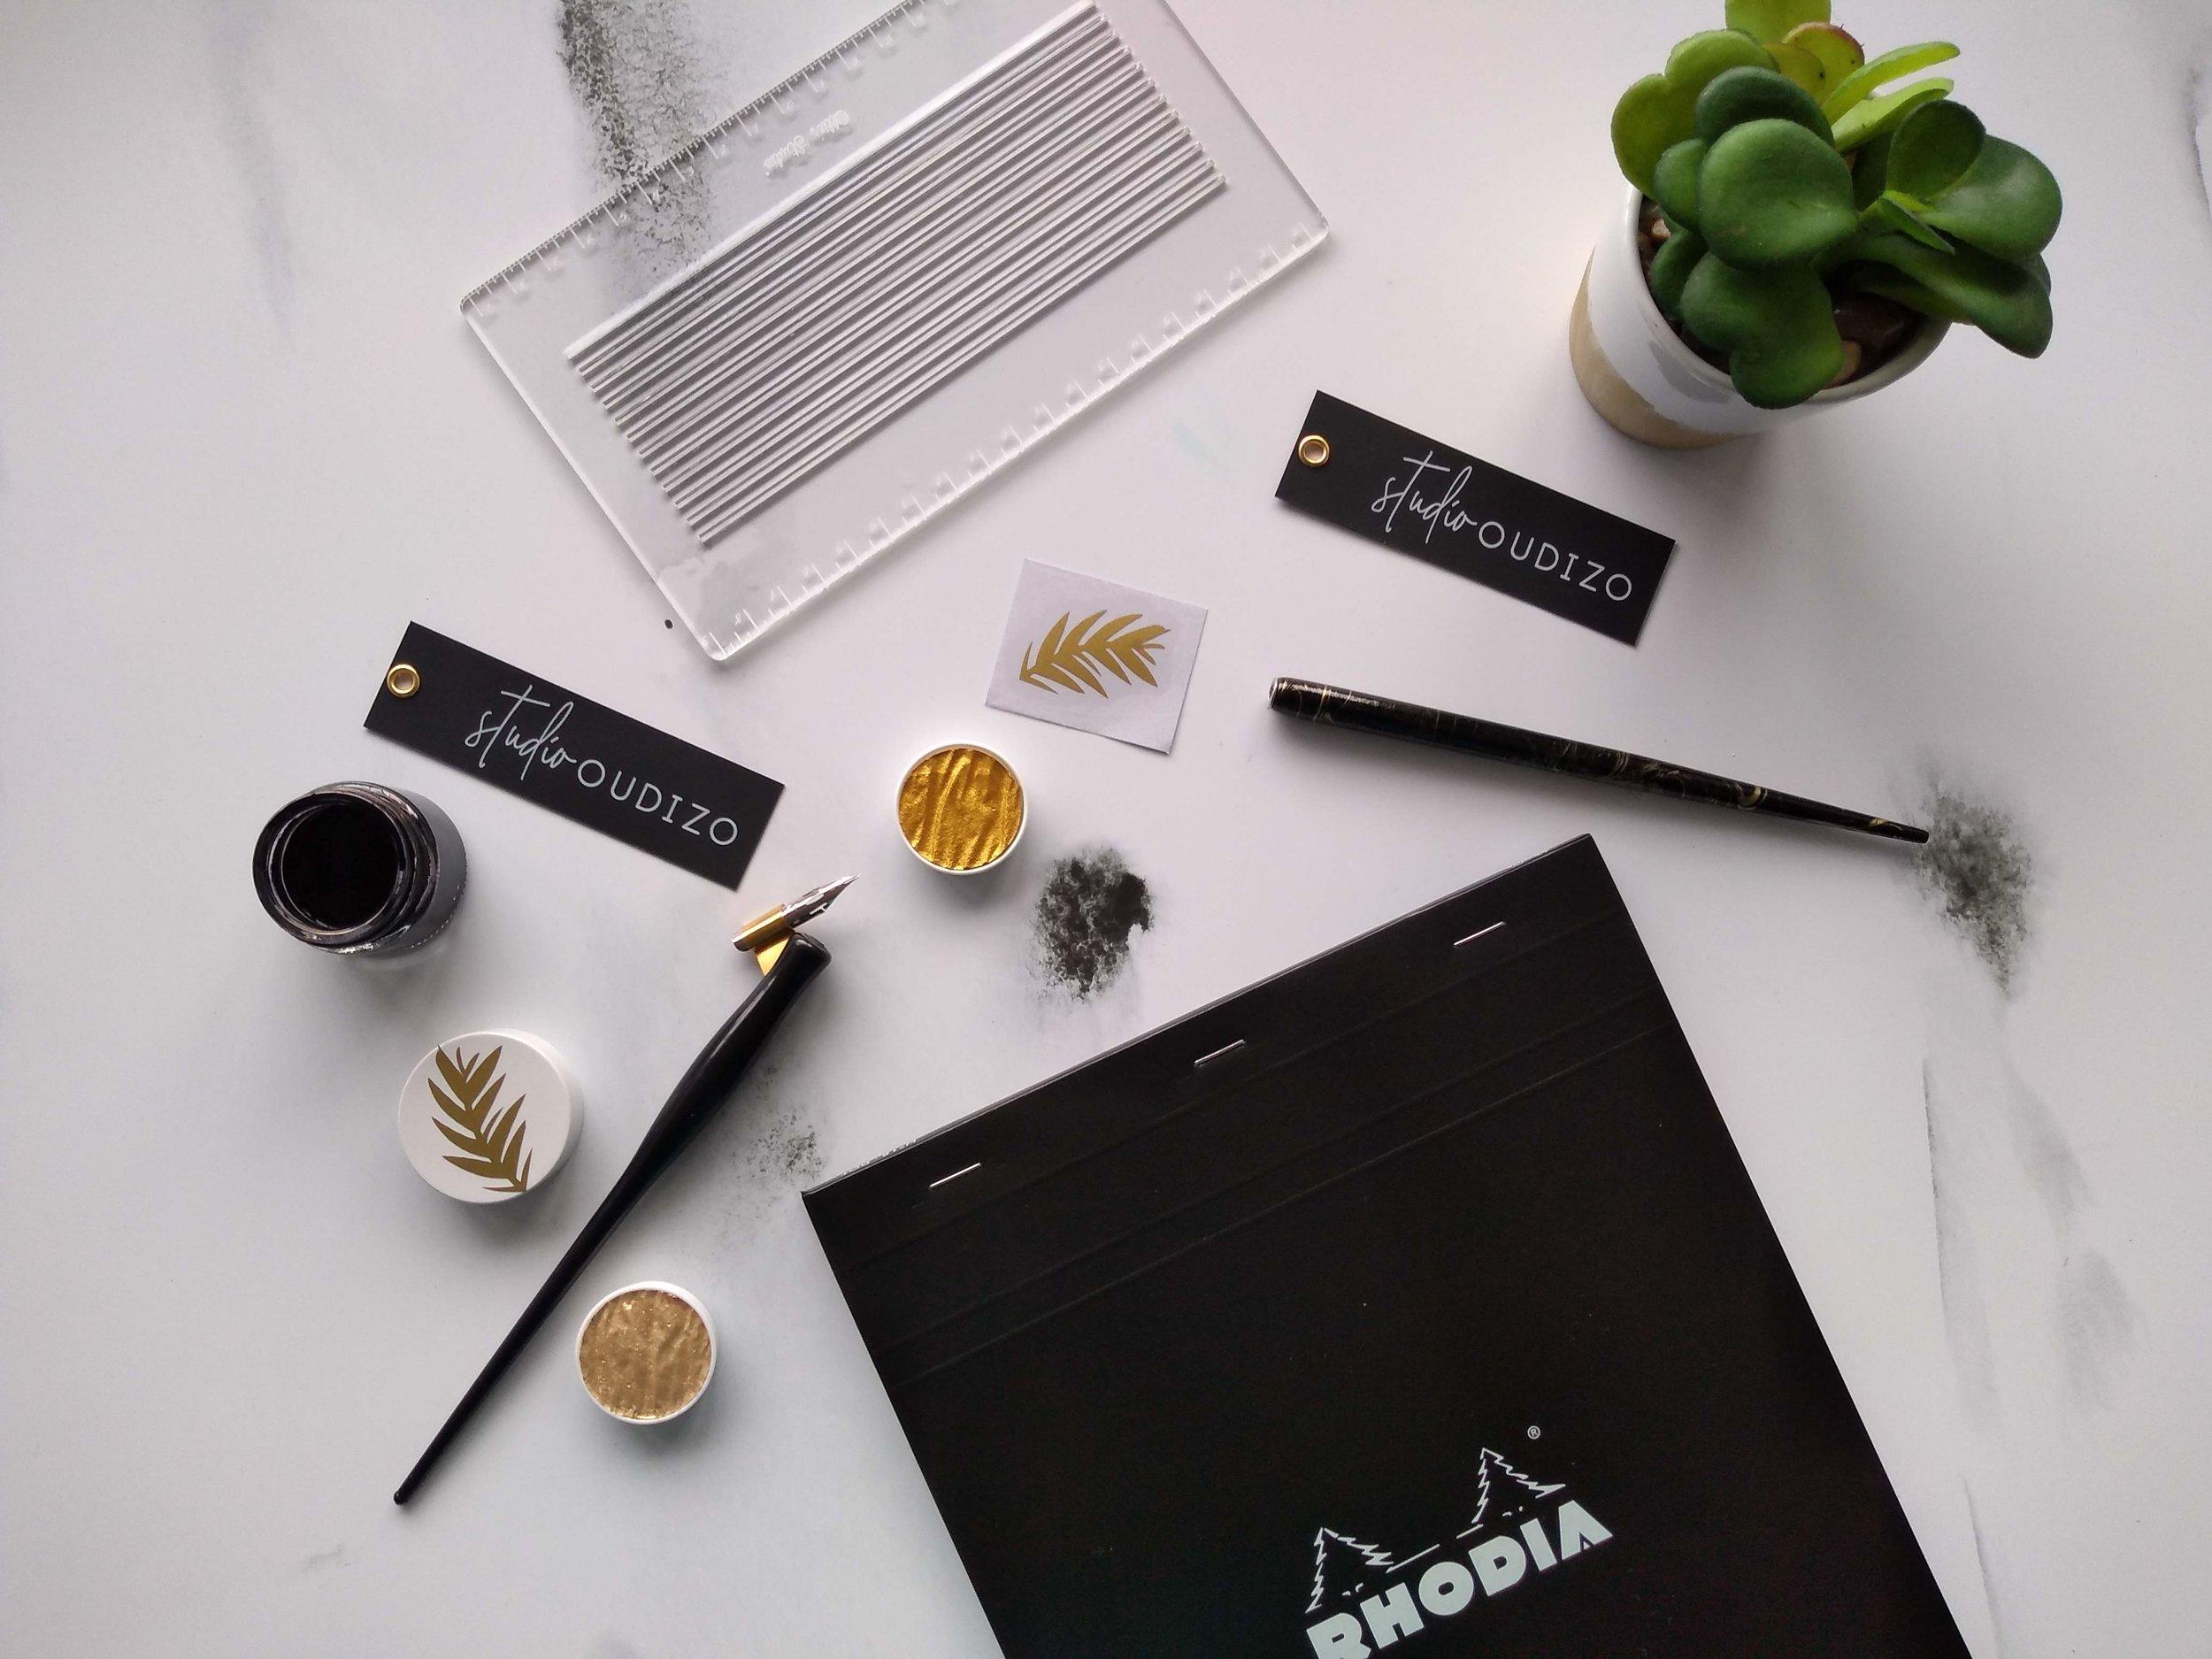 Modern Calligraphy Supplies UK Oblique Pens, Ink, Envelope Guideline Stencil, Rhodia Pads, Finetec Palette